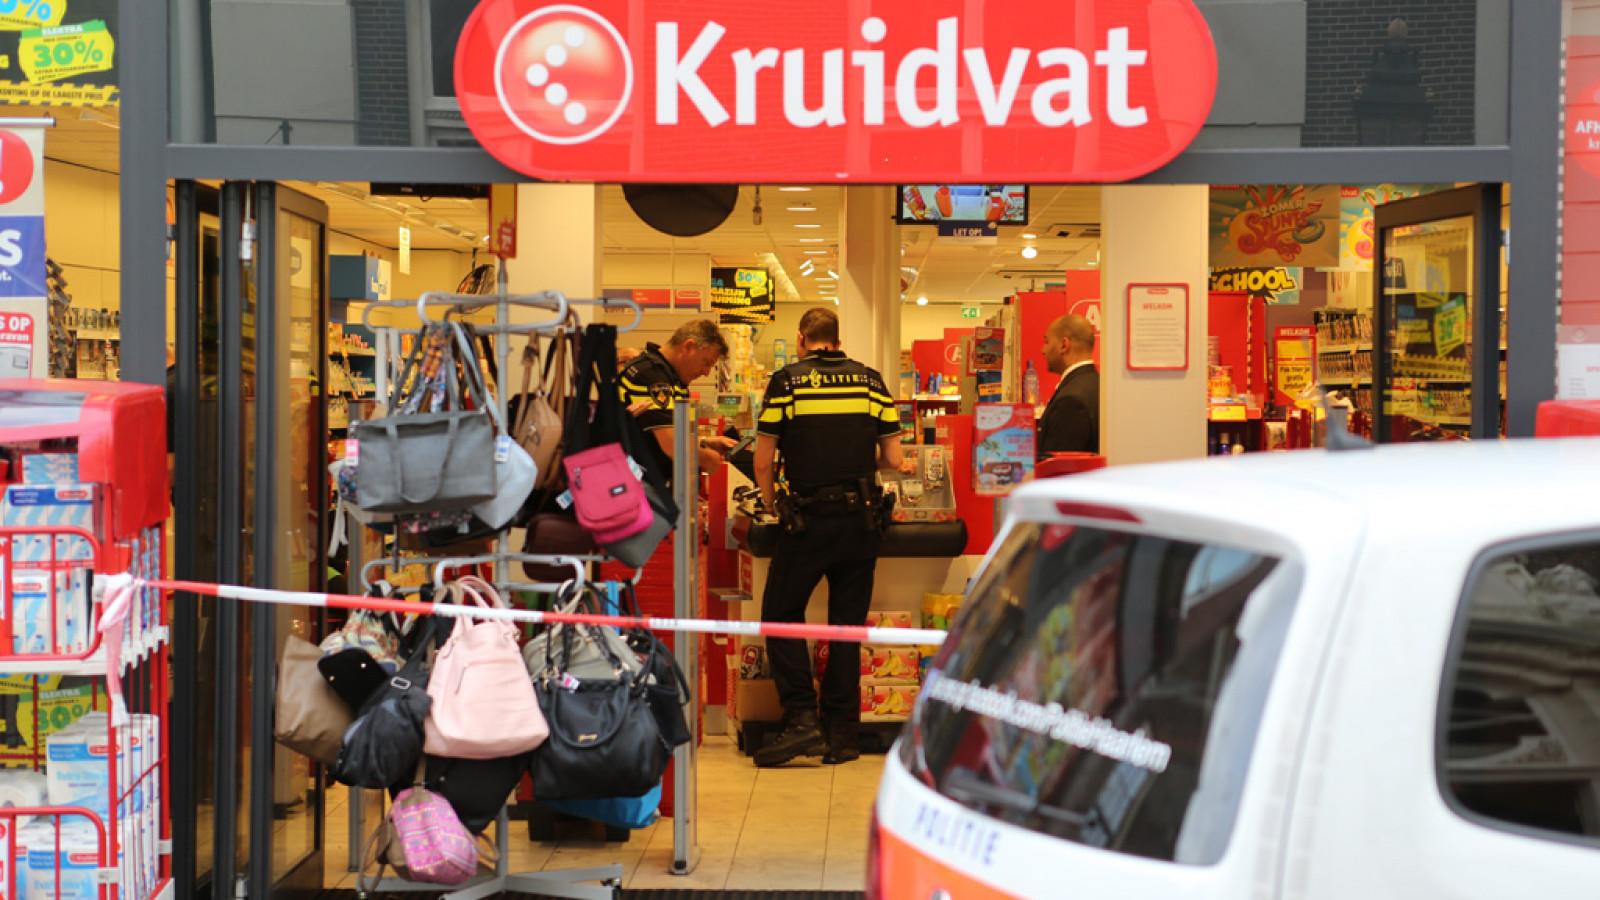 f4fcb15d080 12-jarige krijgt jeugd-tbs voor overval op Kruidvat en Kadohuis - NH ...